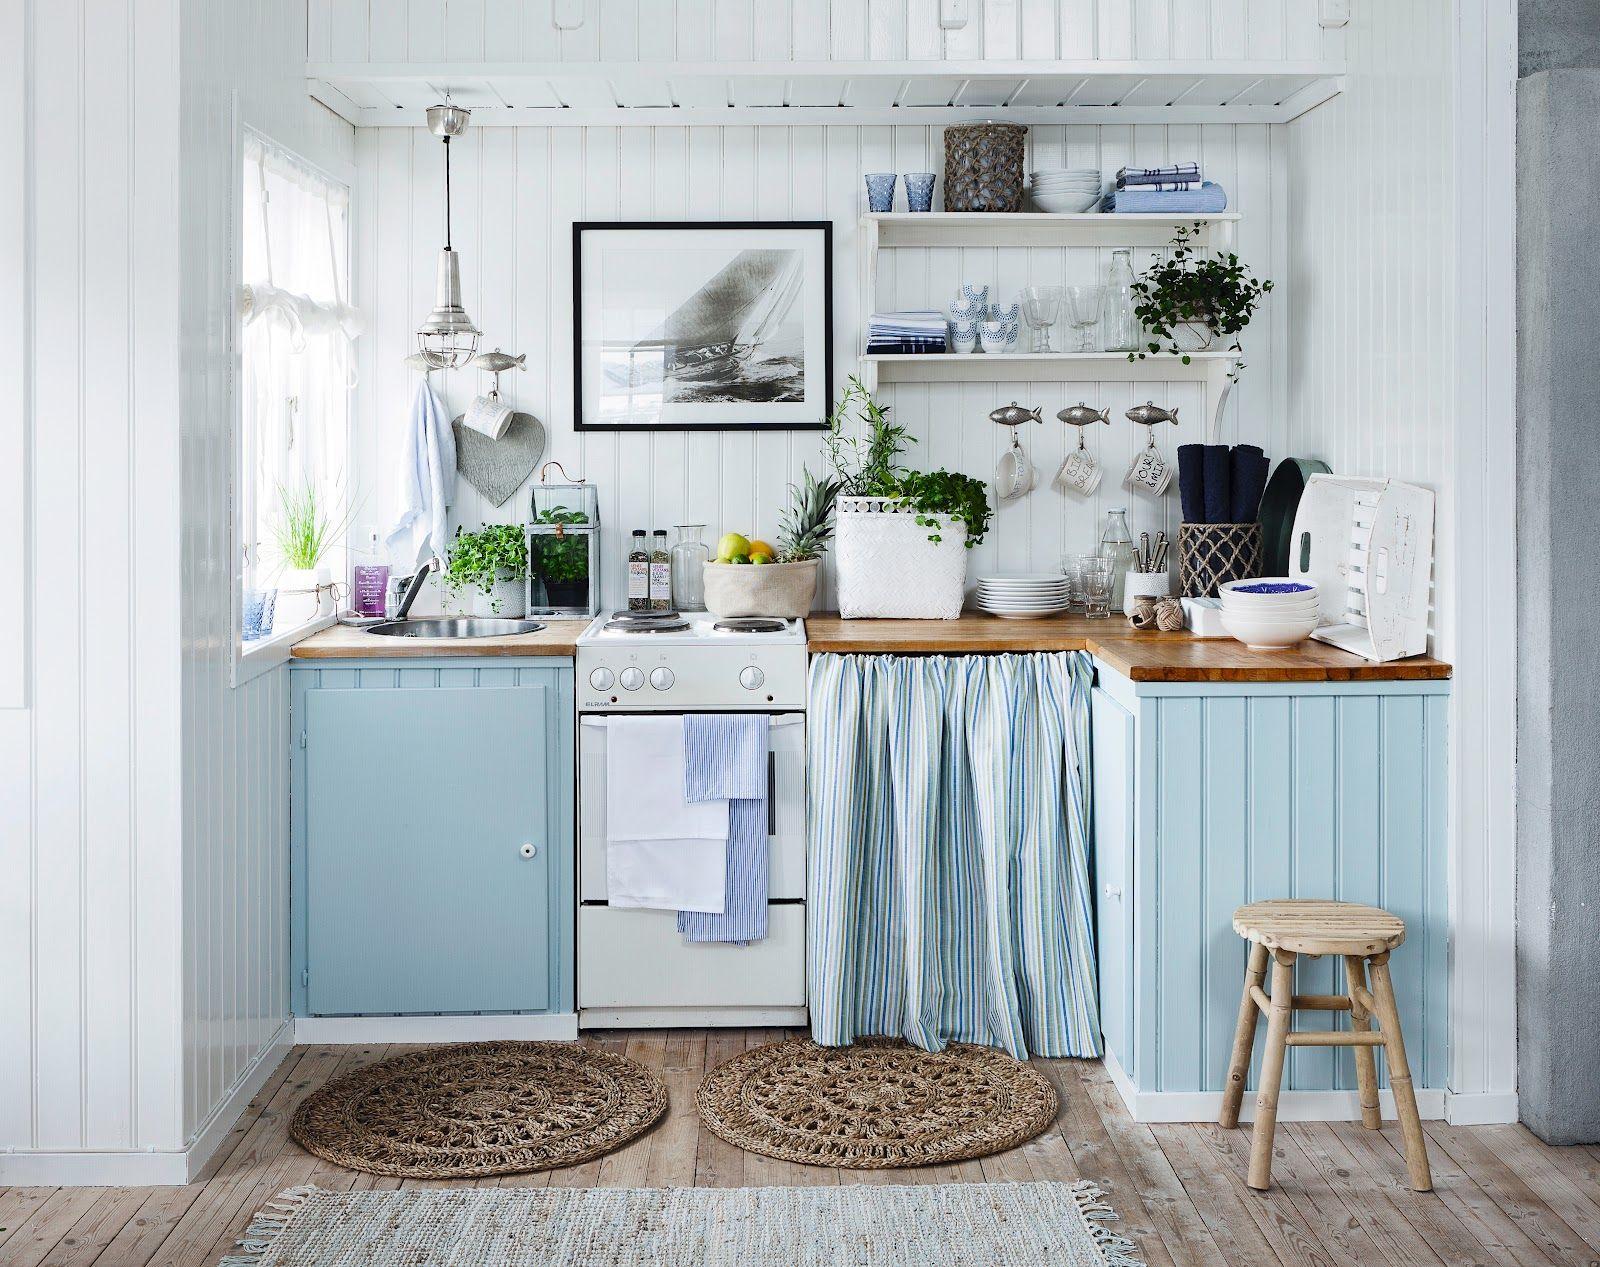 Home and cottage prosjekt sjøbod i langesund kitchen and still